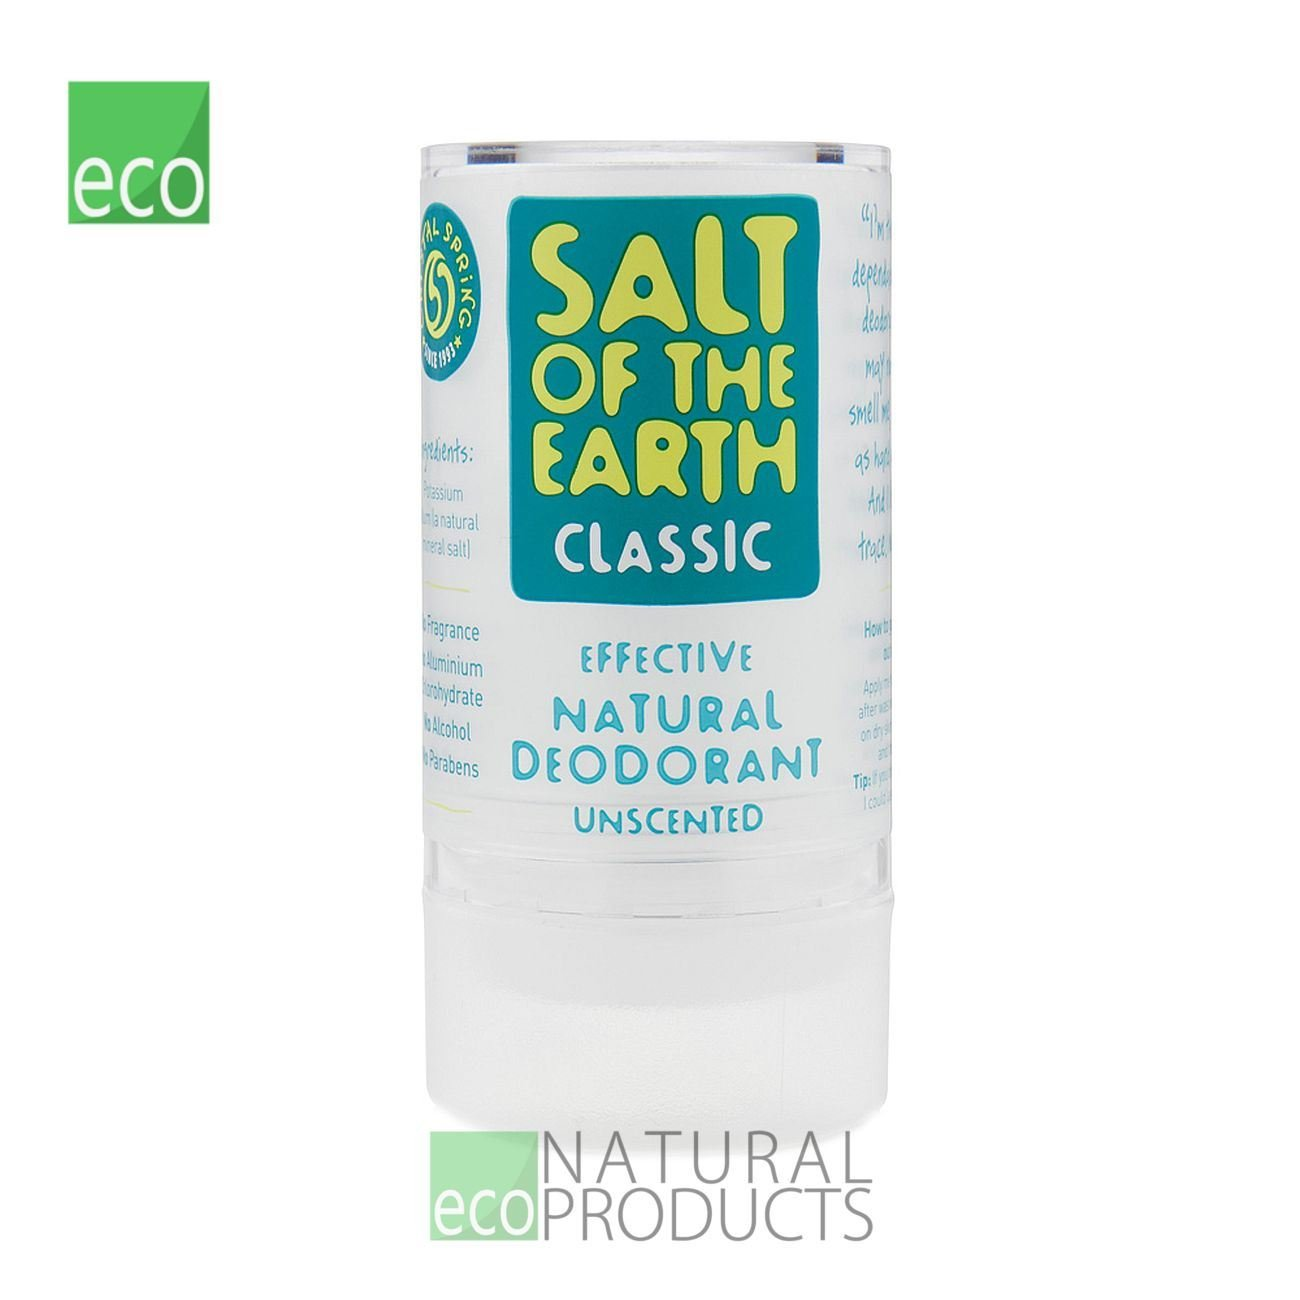 The Healthy Option Crystal Spring Salt Of The Earth Deodorant.